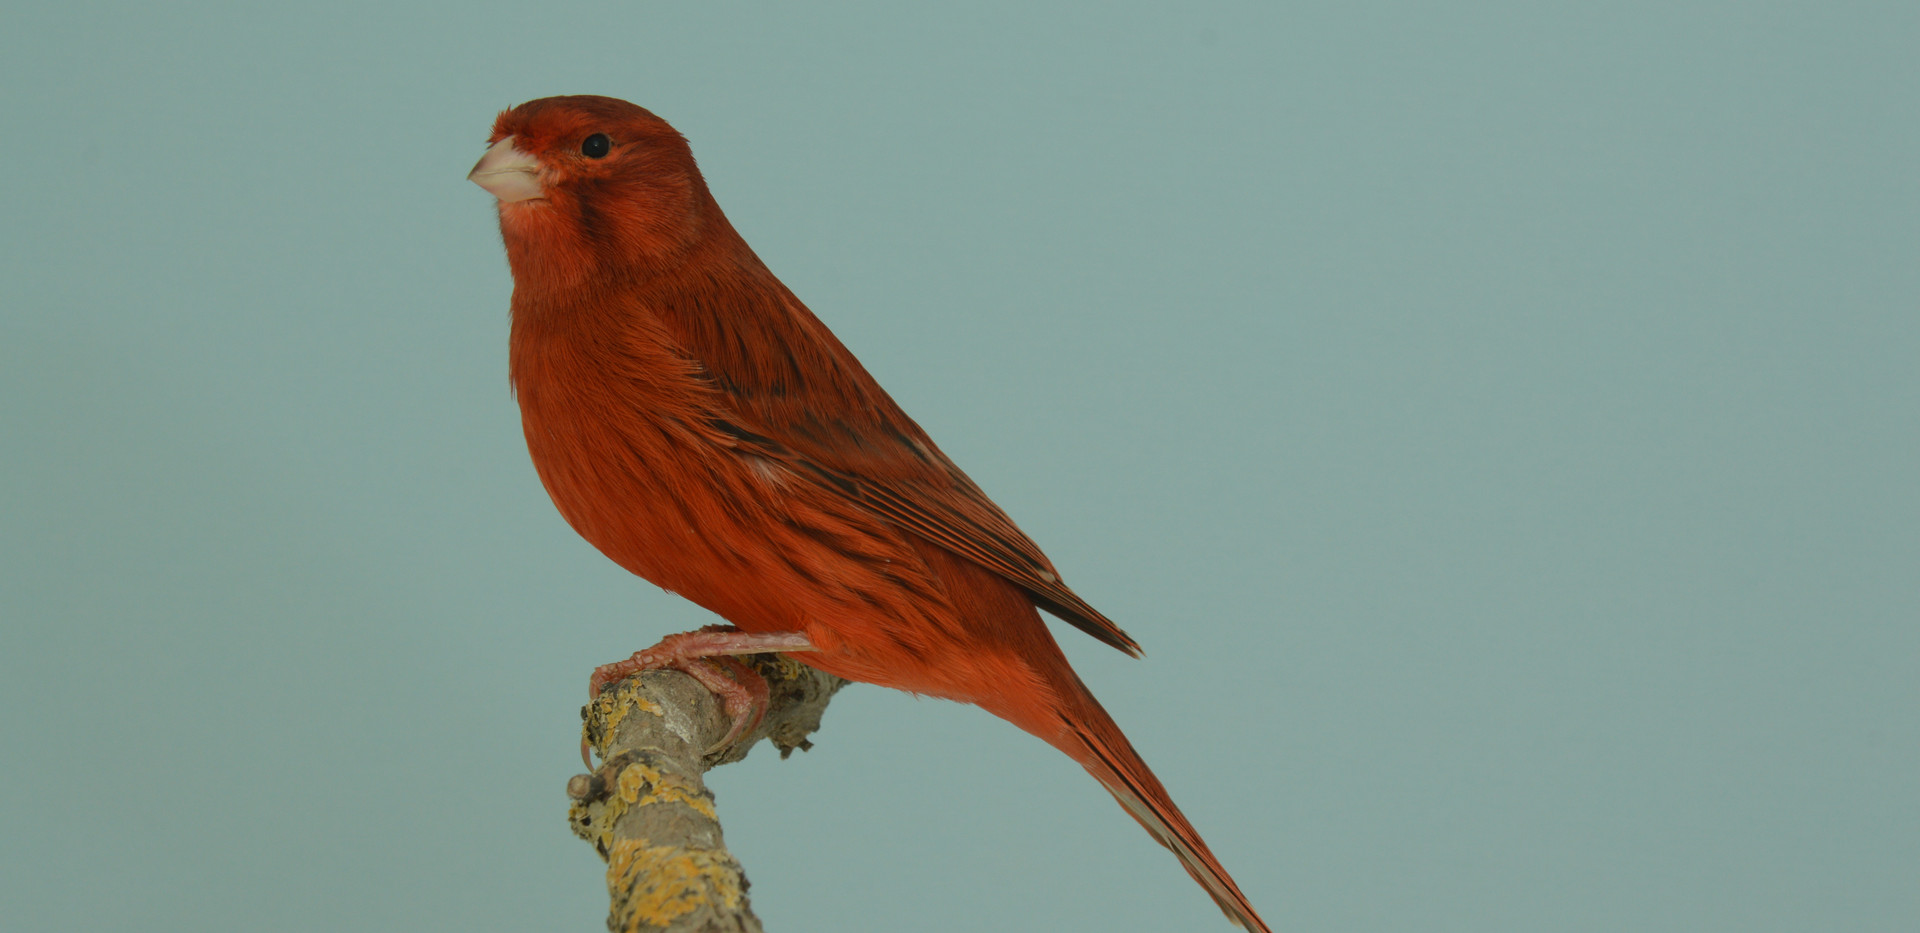 073 hollander kleurkanarie agaat rood in